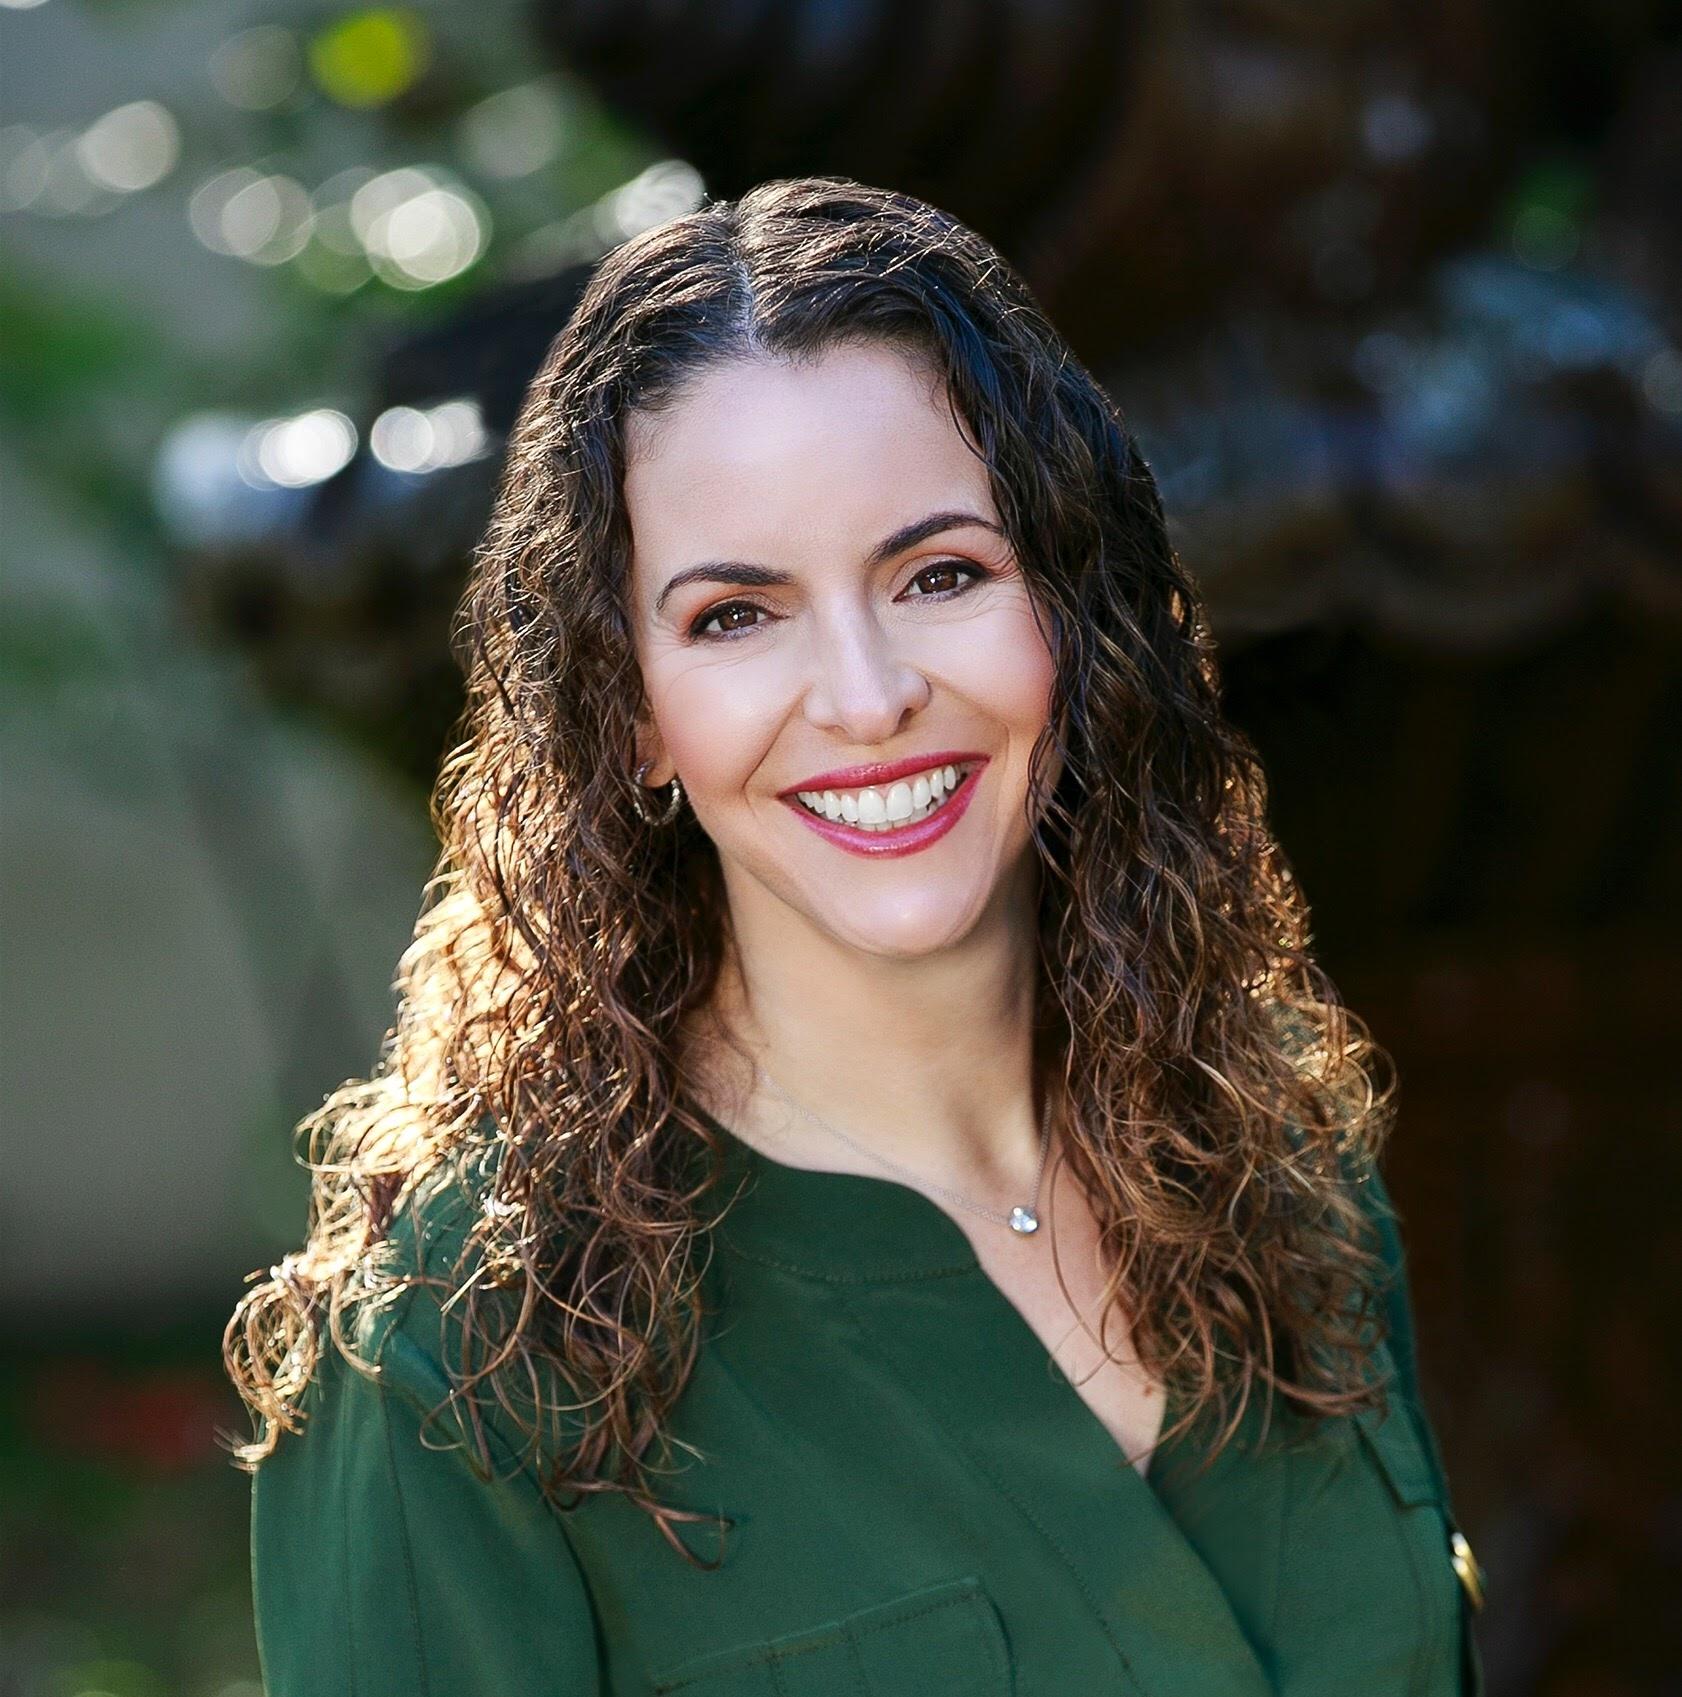 Dr. Michelle Sandberg  Pediatrician at Santa Clara Valley Medical Center, Affiliated Clinical Instructor at Stanford University School of Medicine, Founding board member of Moms Demand Action for Gun Sense in America